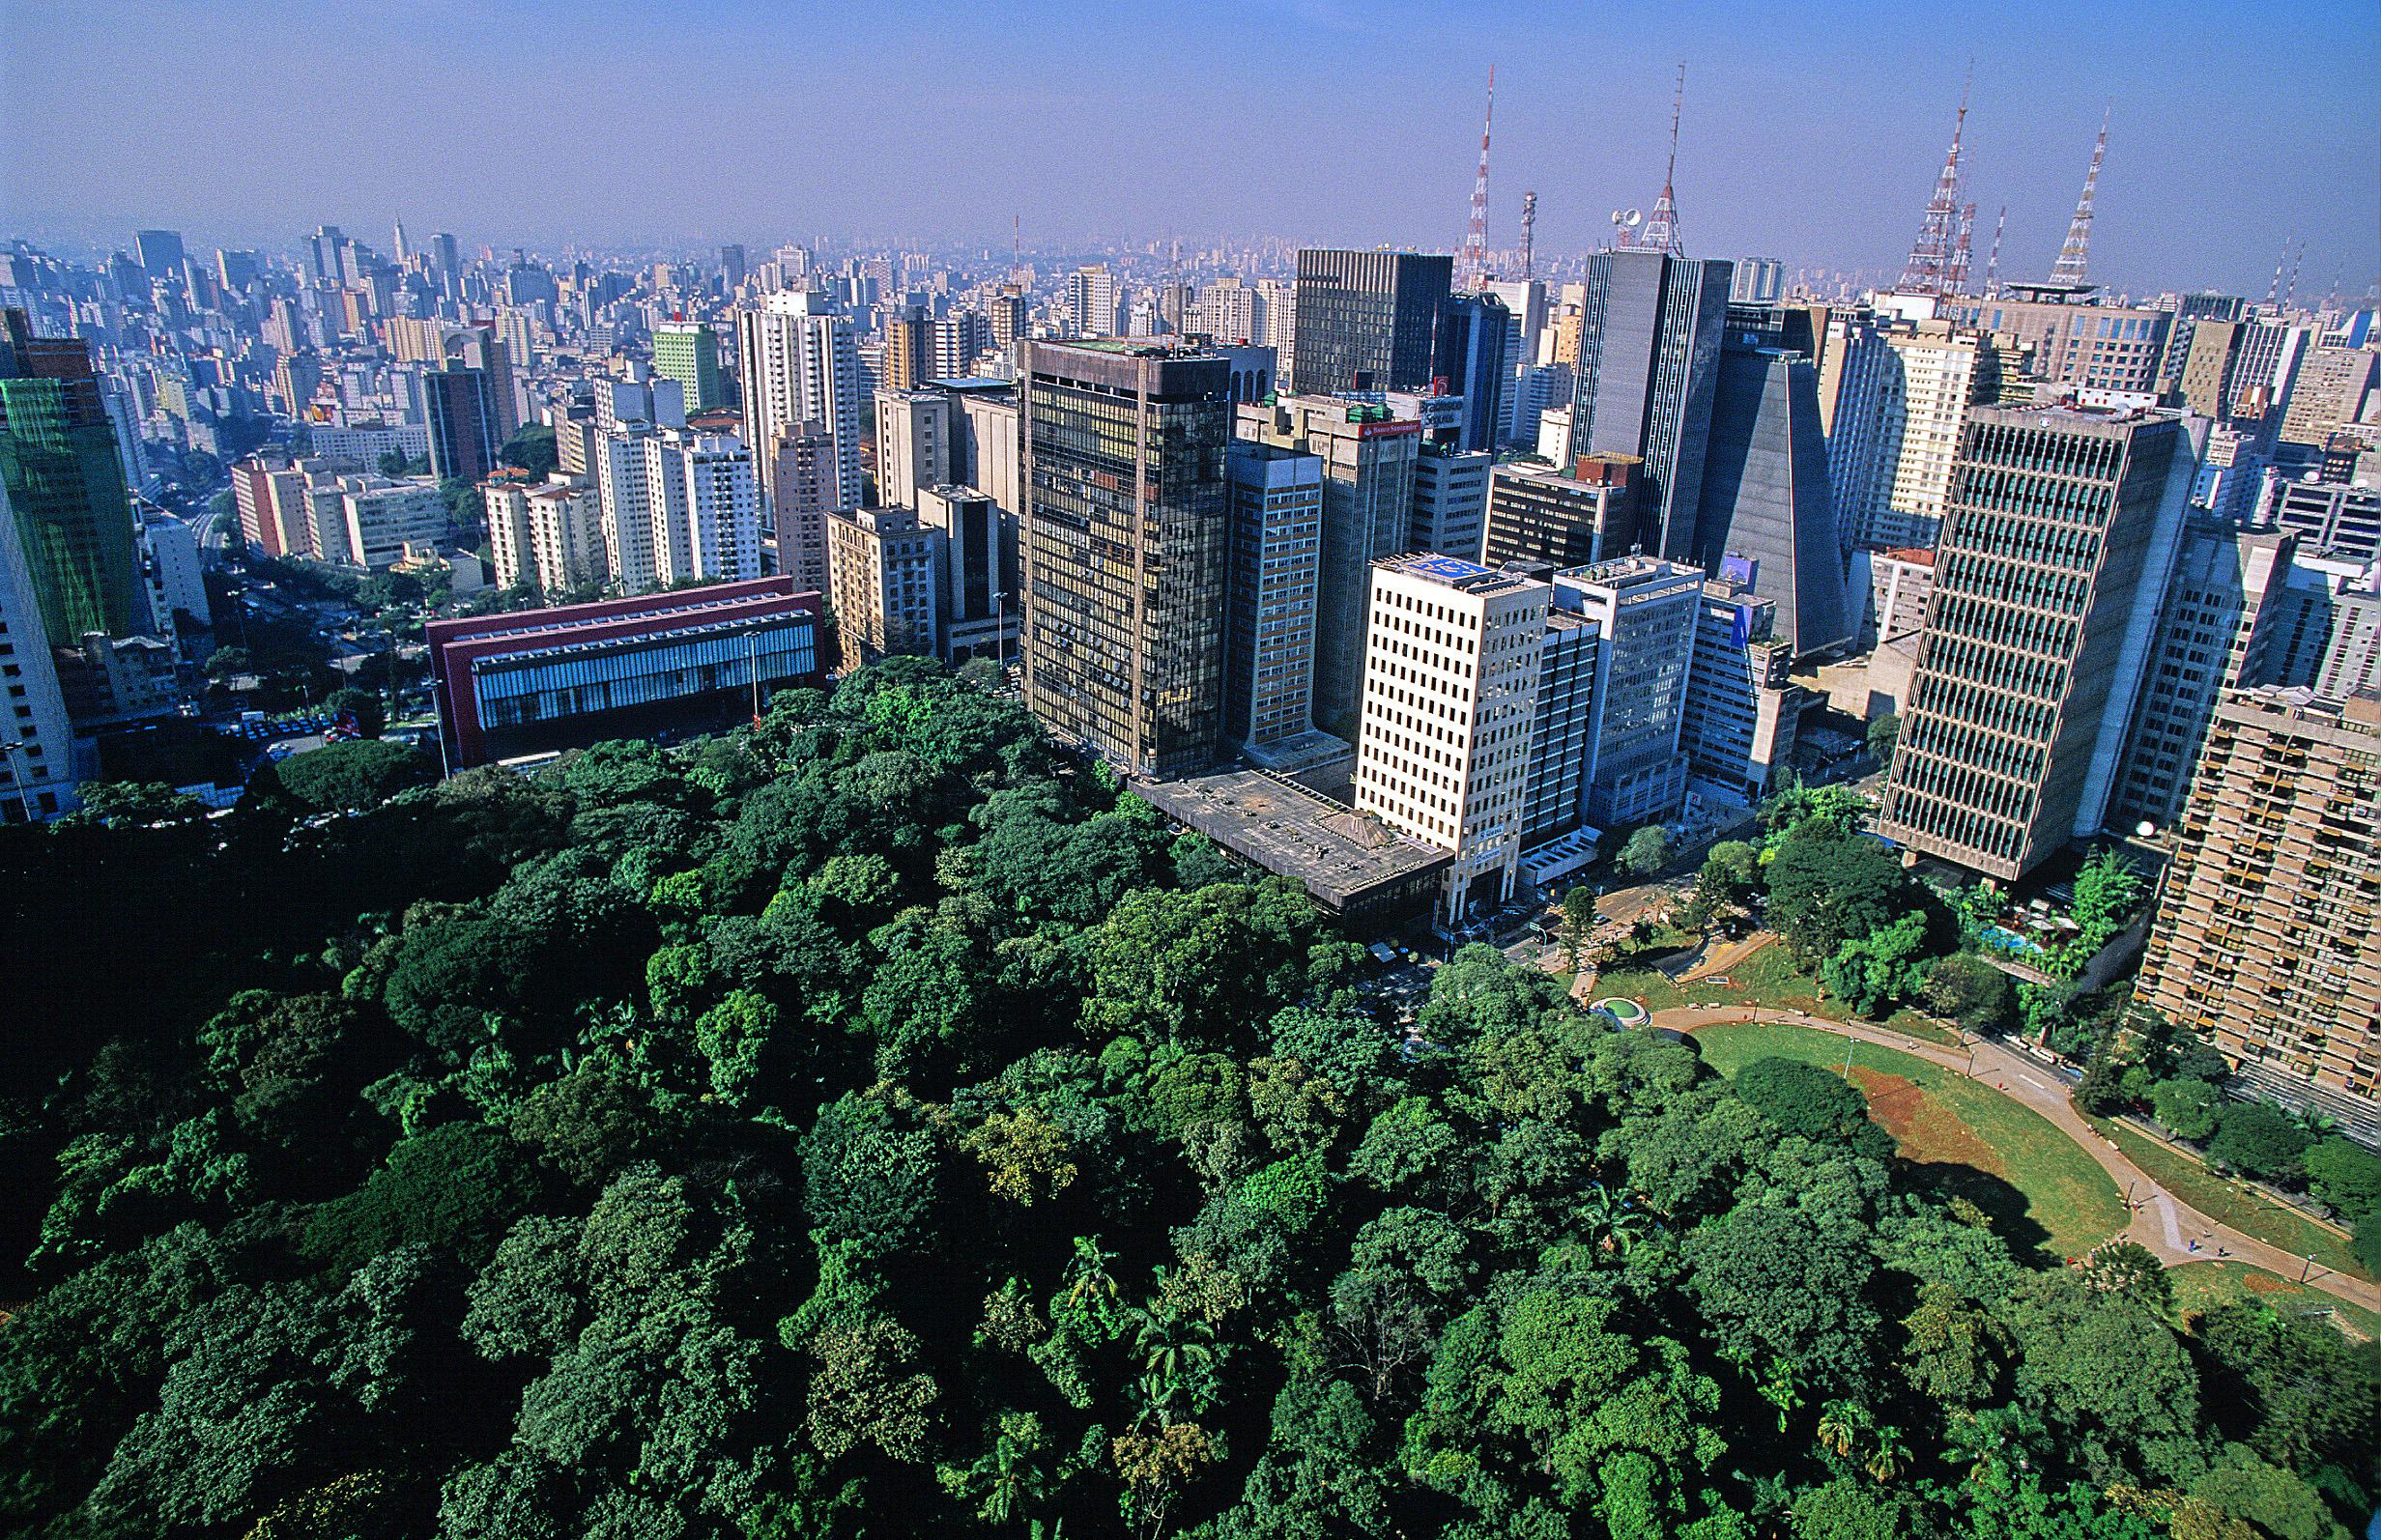 Avenida Paulista/MASP